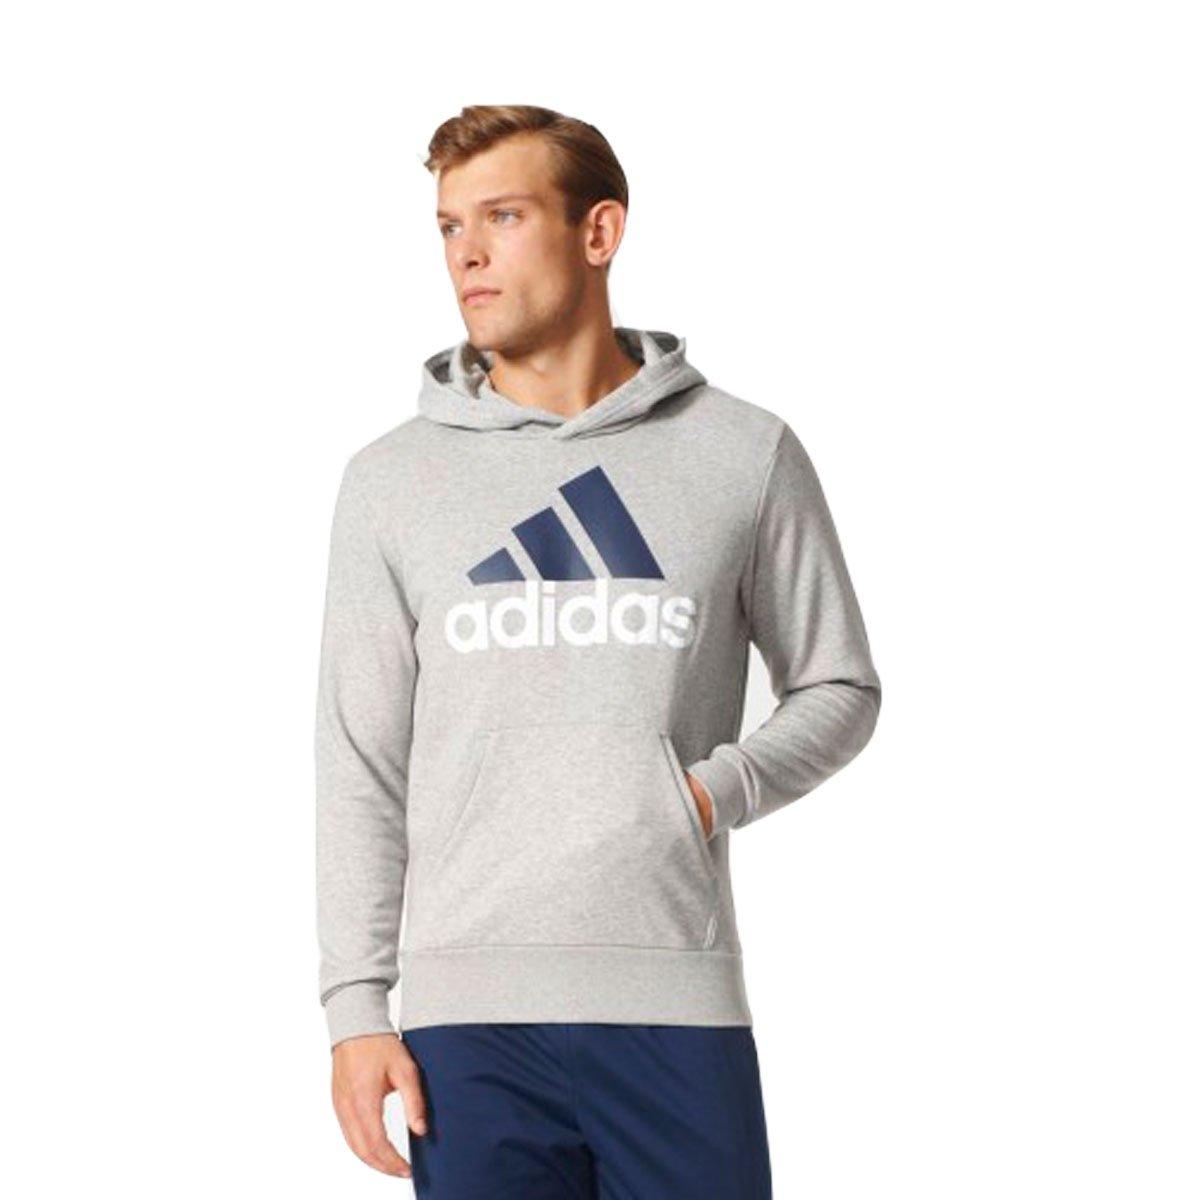 9e91b7d70b2 Bizz Store - Moletom Masculino Adidas Essentials Linear Cinza